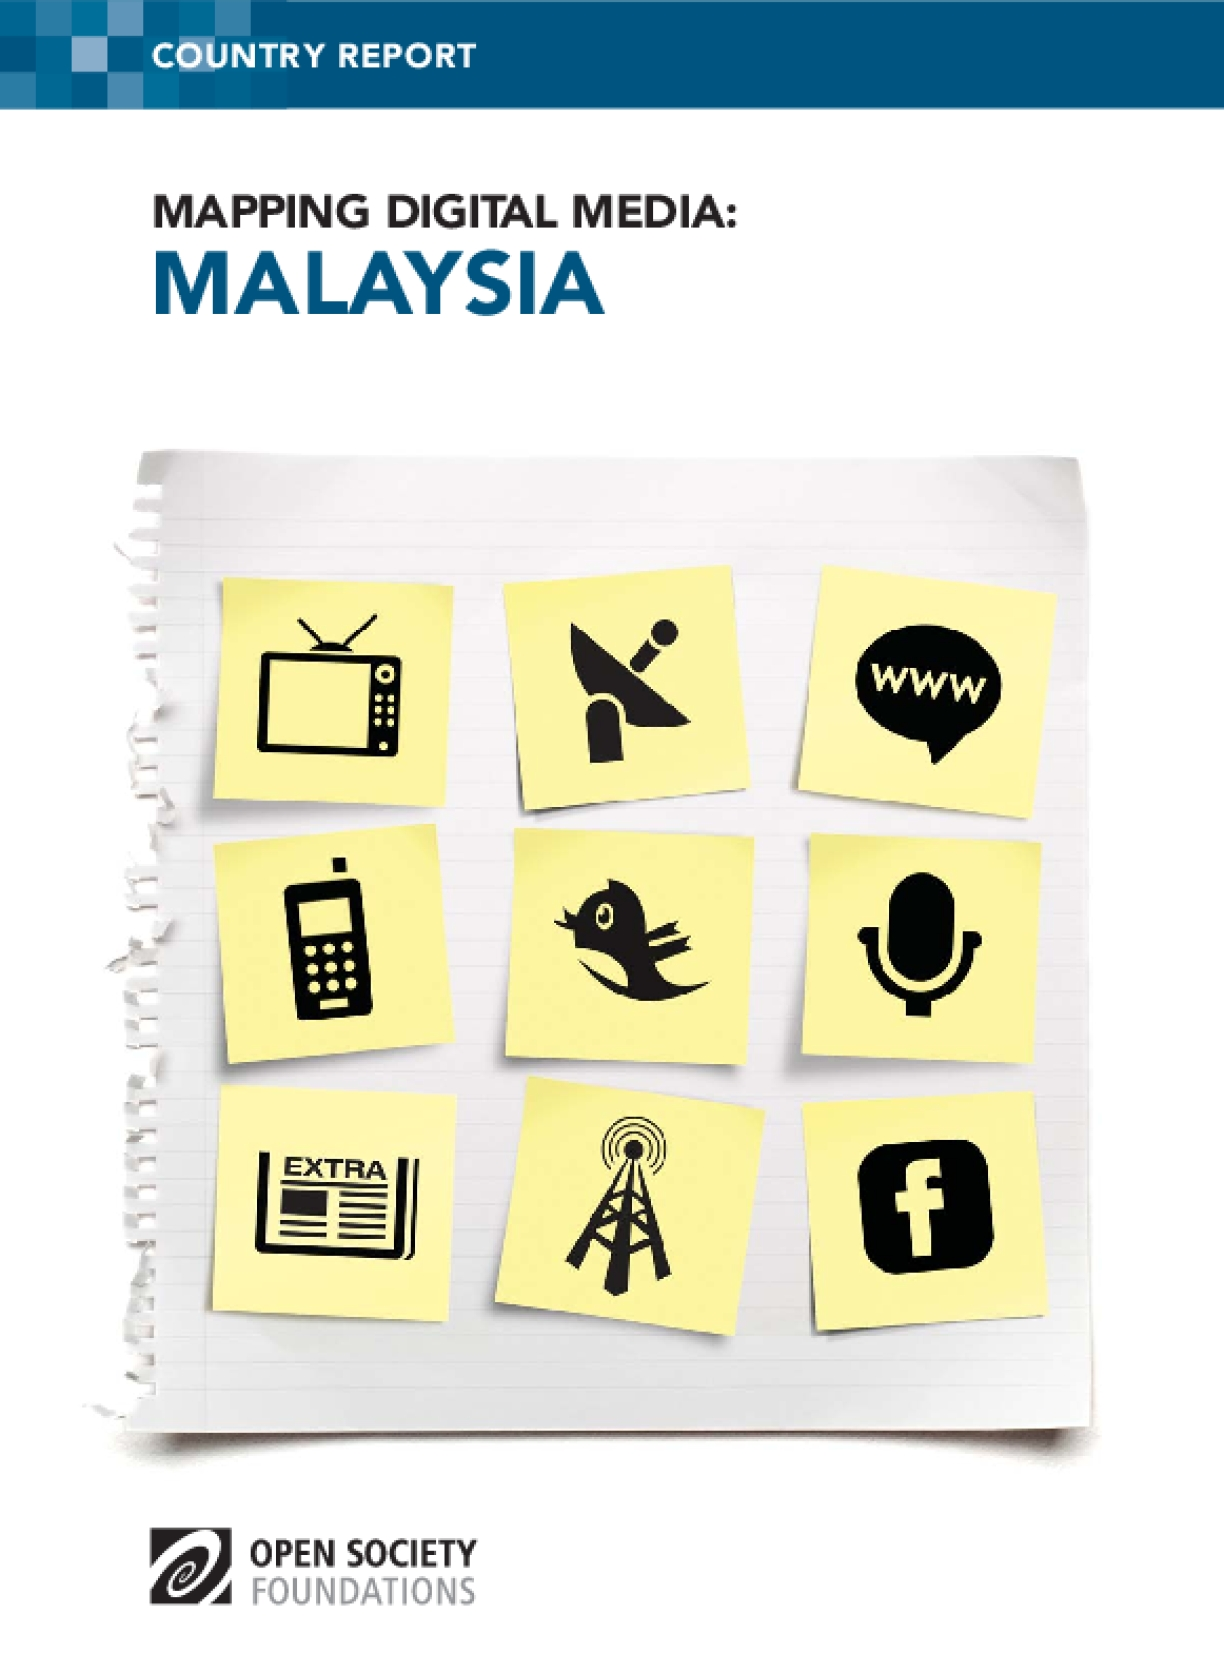 Mapping Digital Media: Malaysia